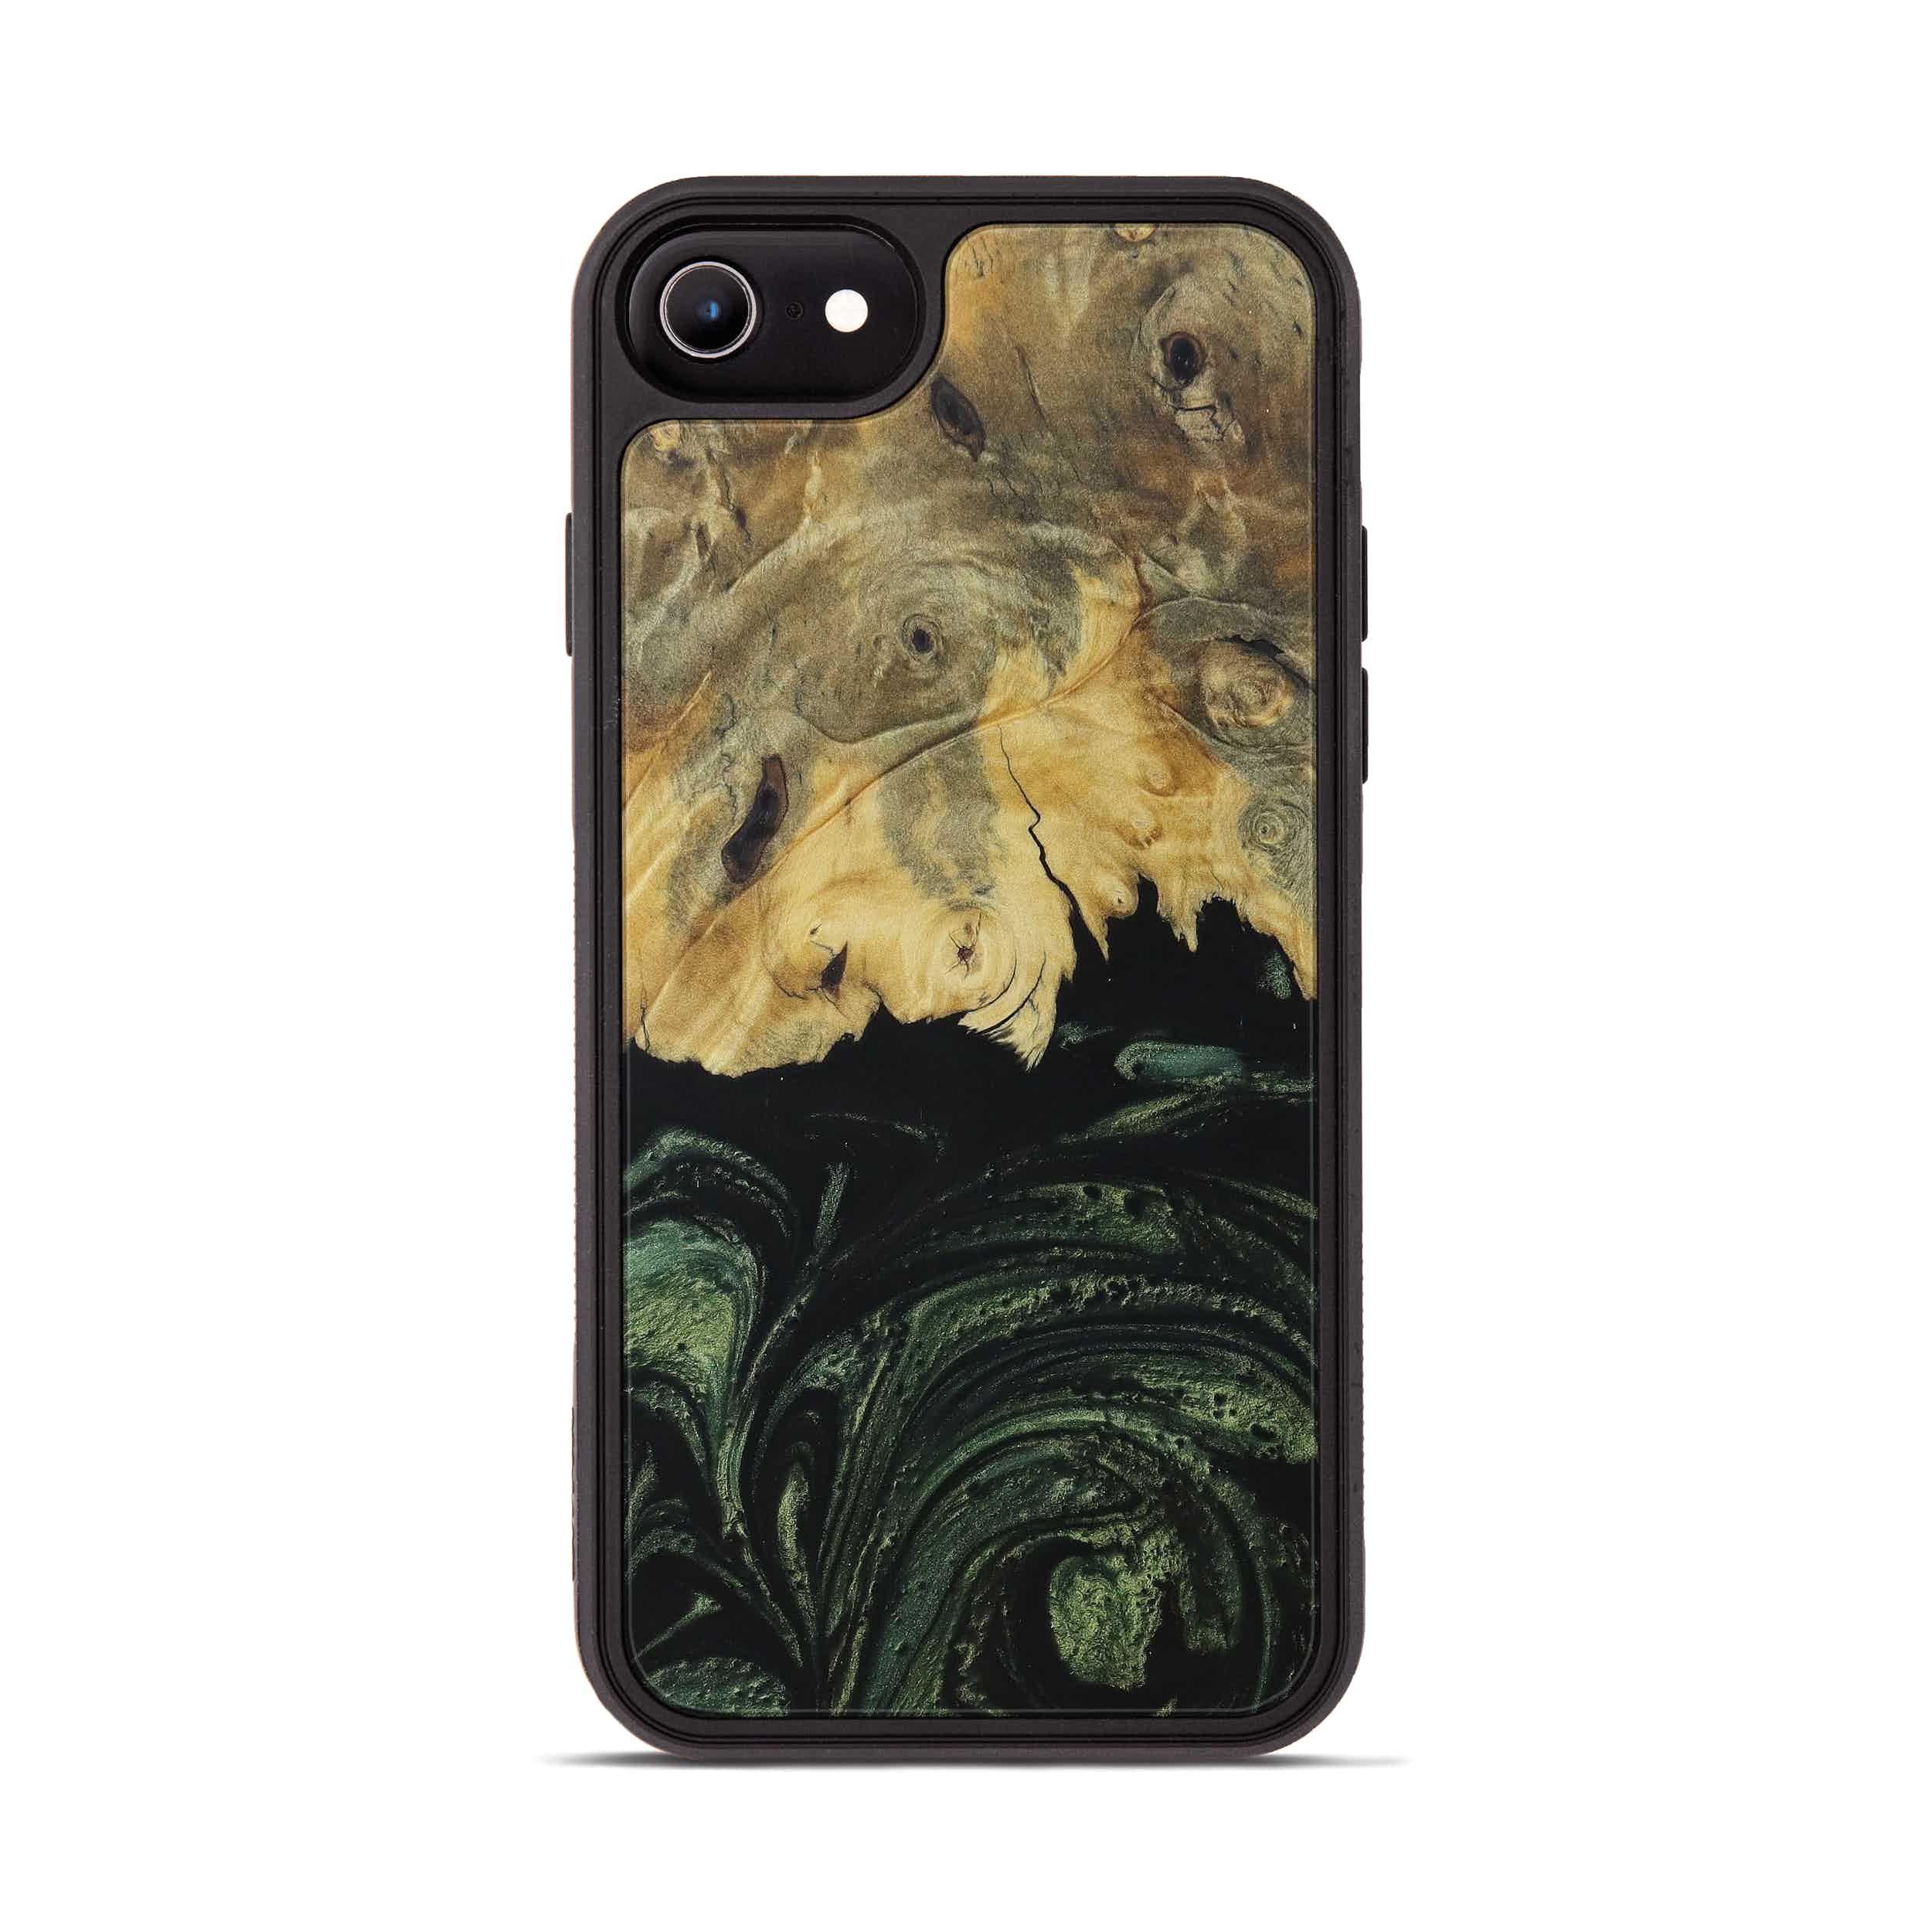 iPhone 6s Wood+Resin Phone Case - Gleda (Dark Green, 395049)